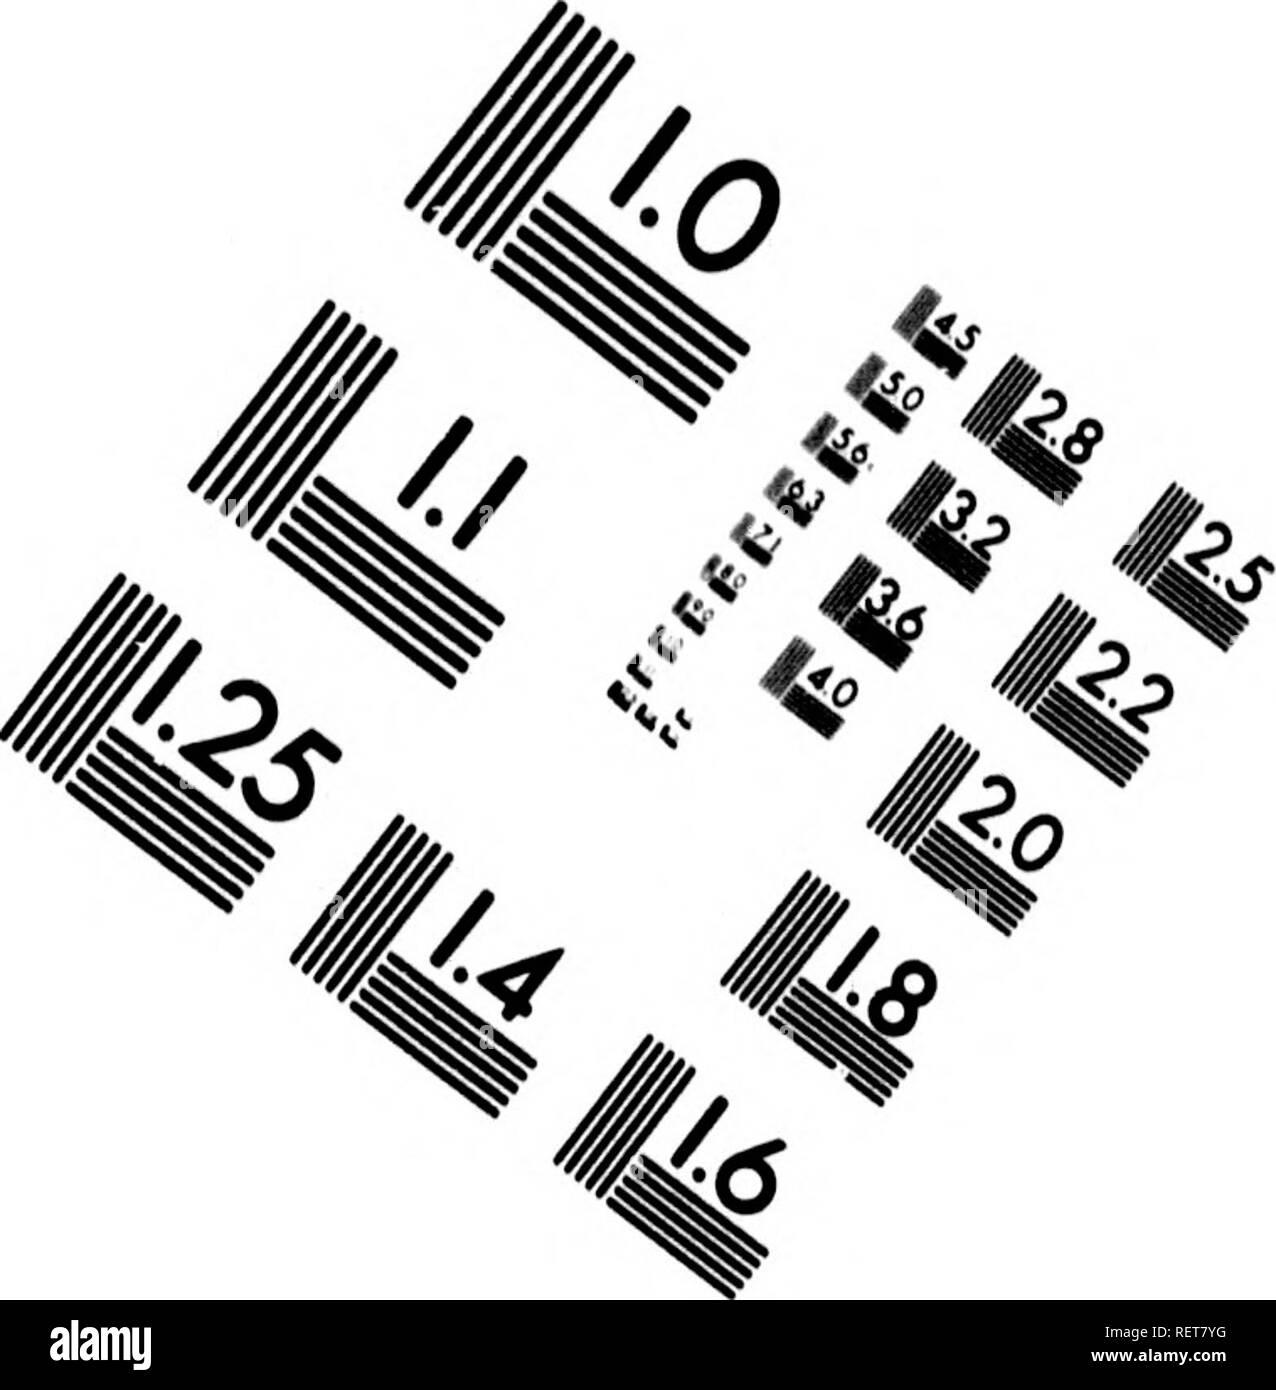 . Histoire naturelle de Buffon [microforme] : classée par ordres, genres et espèces, d'après le système de Linné avec les caractères géné riques et la nomenclature Linnéenne. Sciences naturelles; Ornithologie; Natural history; Ornithology. IMAGE EVALUATION TEST TARGET (MT-S). 1.0 îf i^ IIIIIM l.l 1.25 1.4 2.2 M L8 1.6 V] ^  % V 6^ ^ ^. Please note that these images are extracted from scanned page images that may have been digitally enhanced for readability - coloration and appearance of these illustrations may not perfectly resemble the original work.. Castel, René-Richard, 1758-1832; Buffon - Stock Image